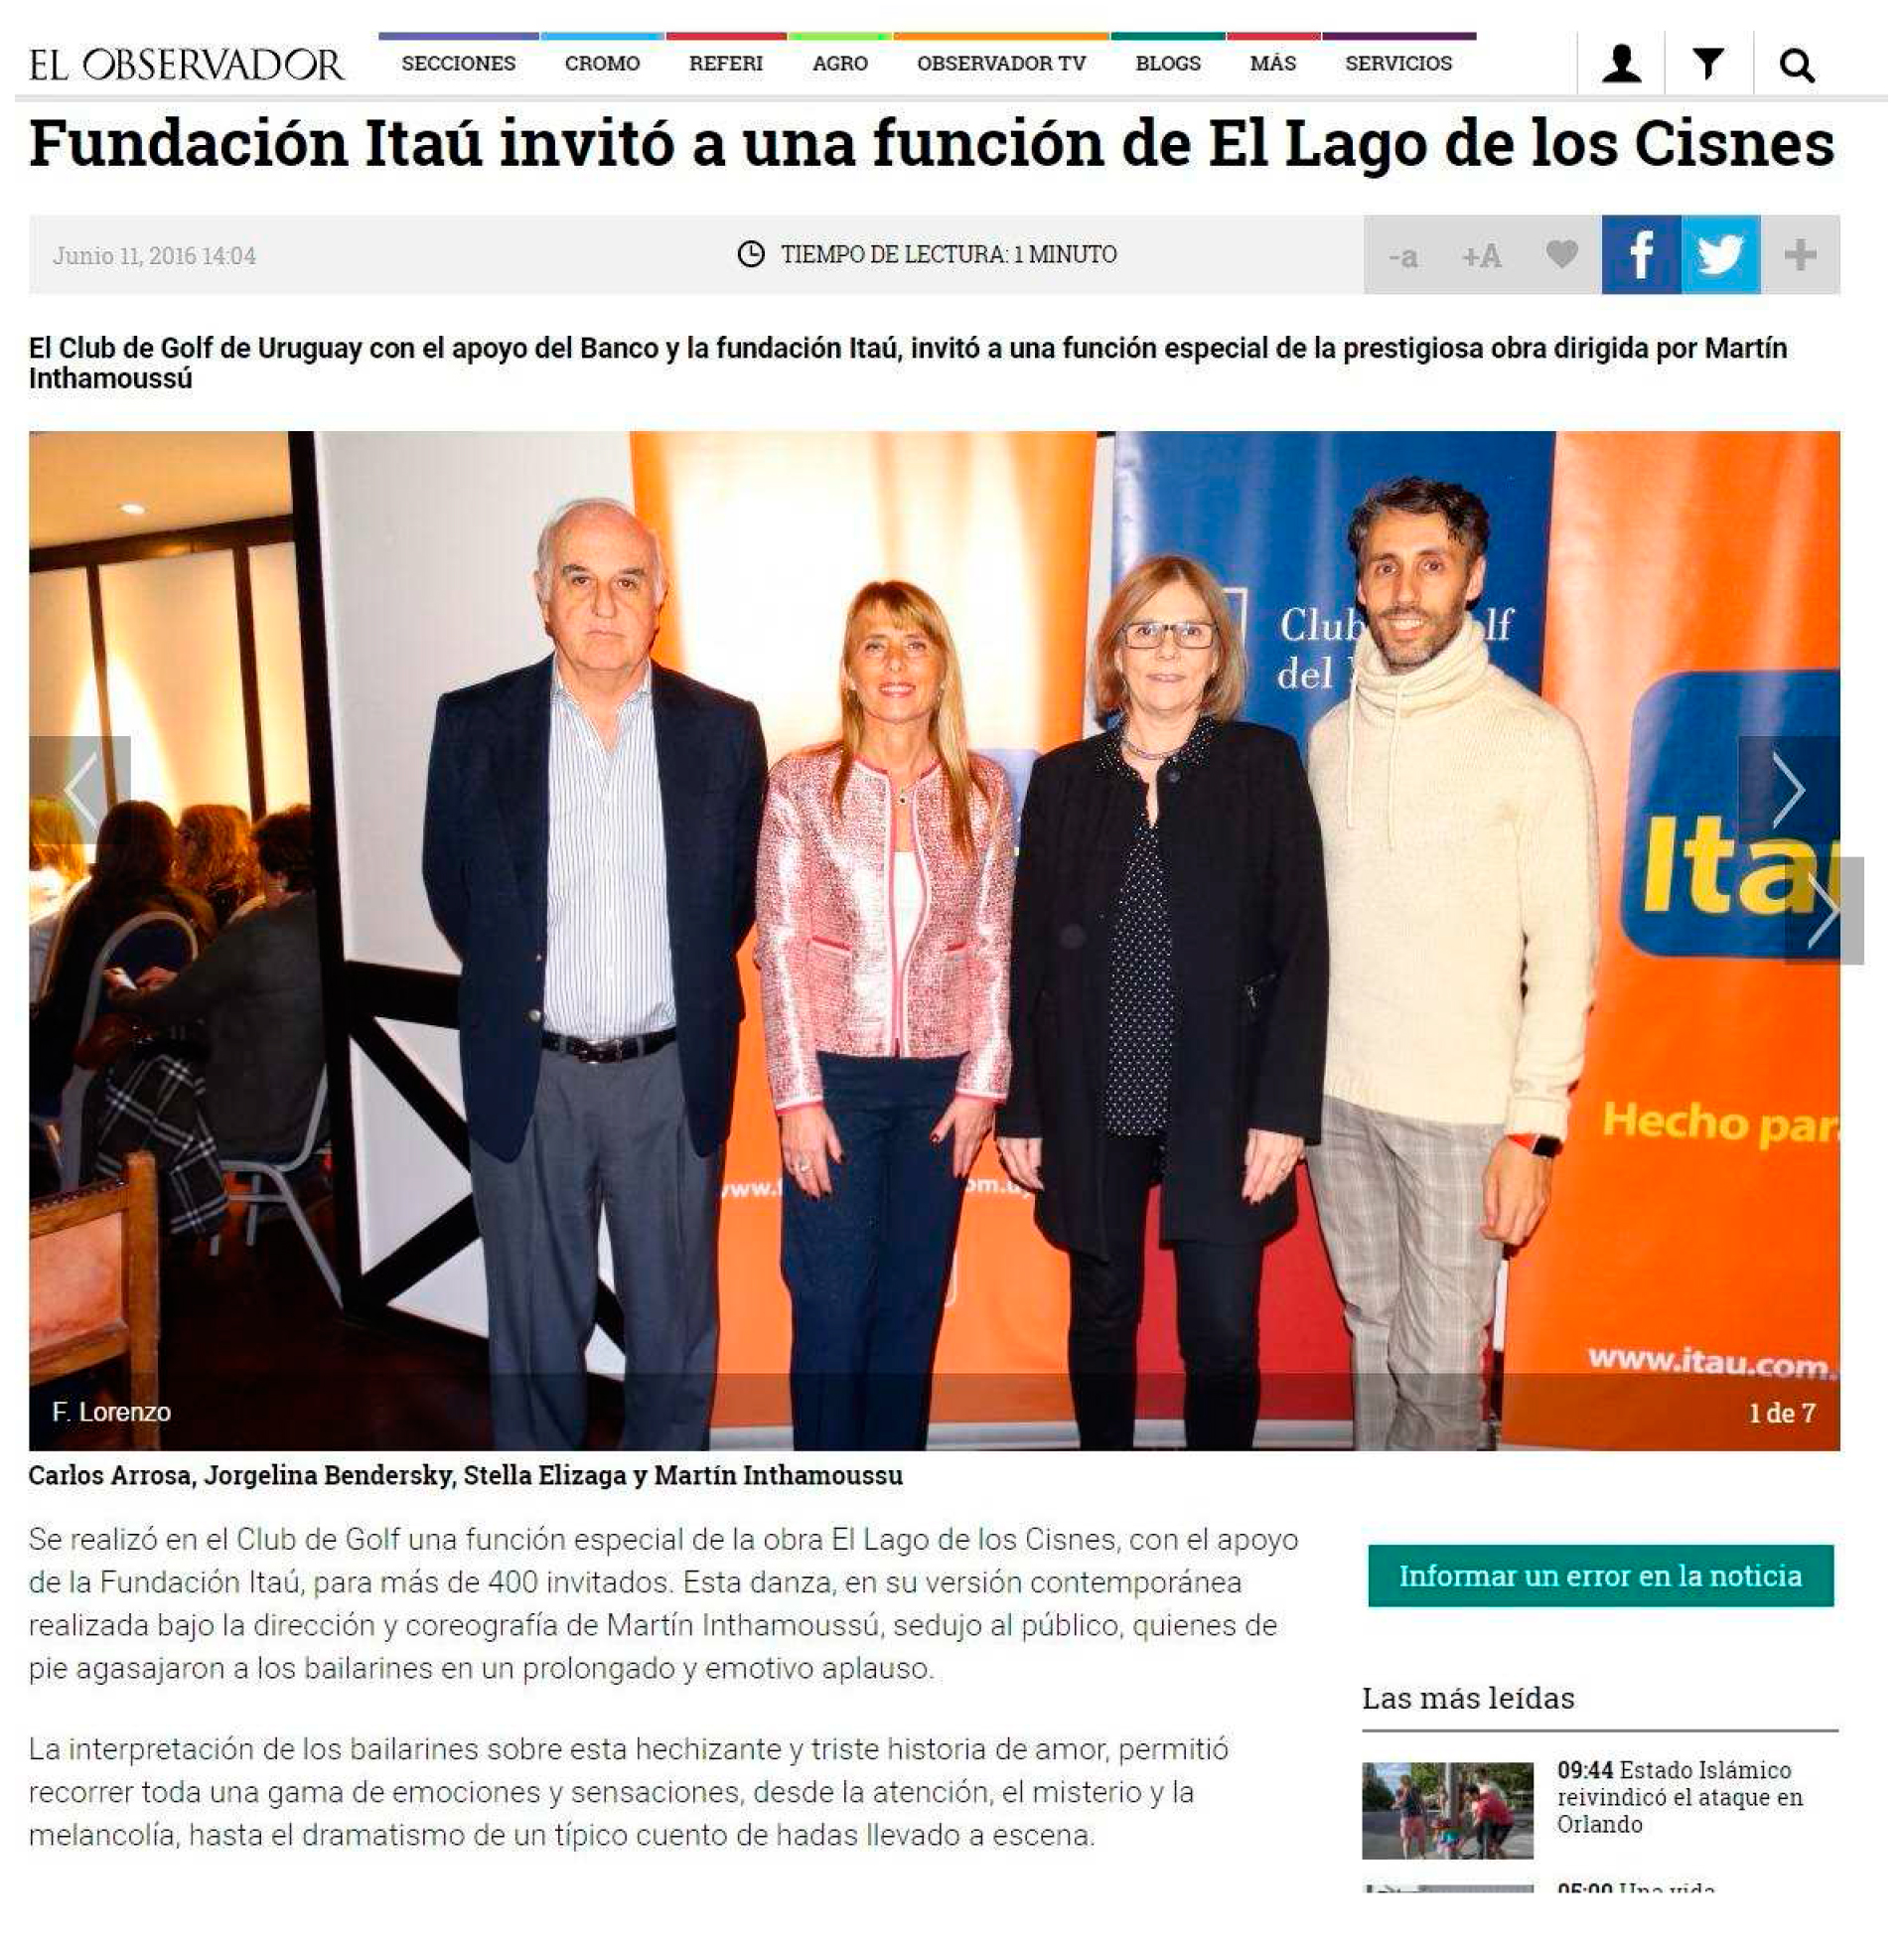 Cobertura de Prensa - Junio 2016